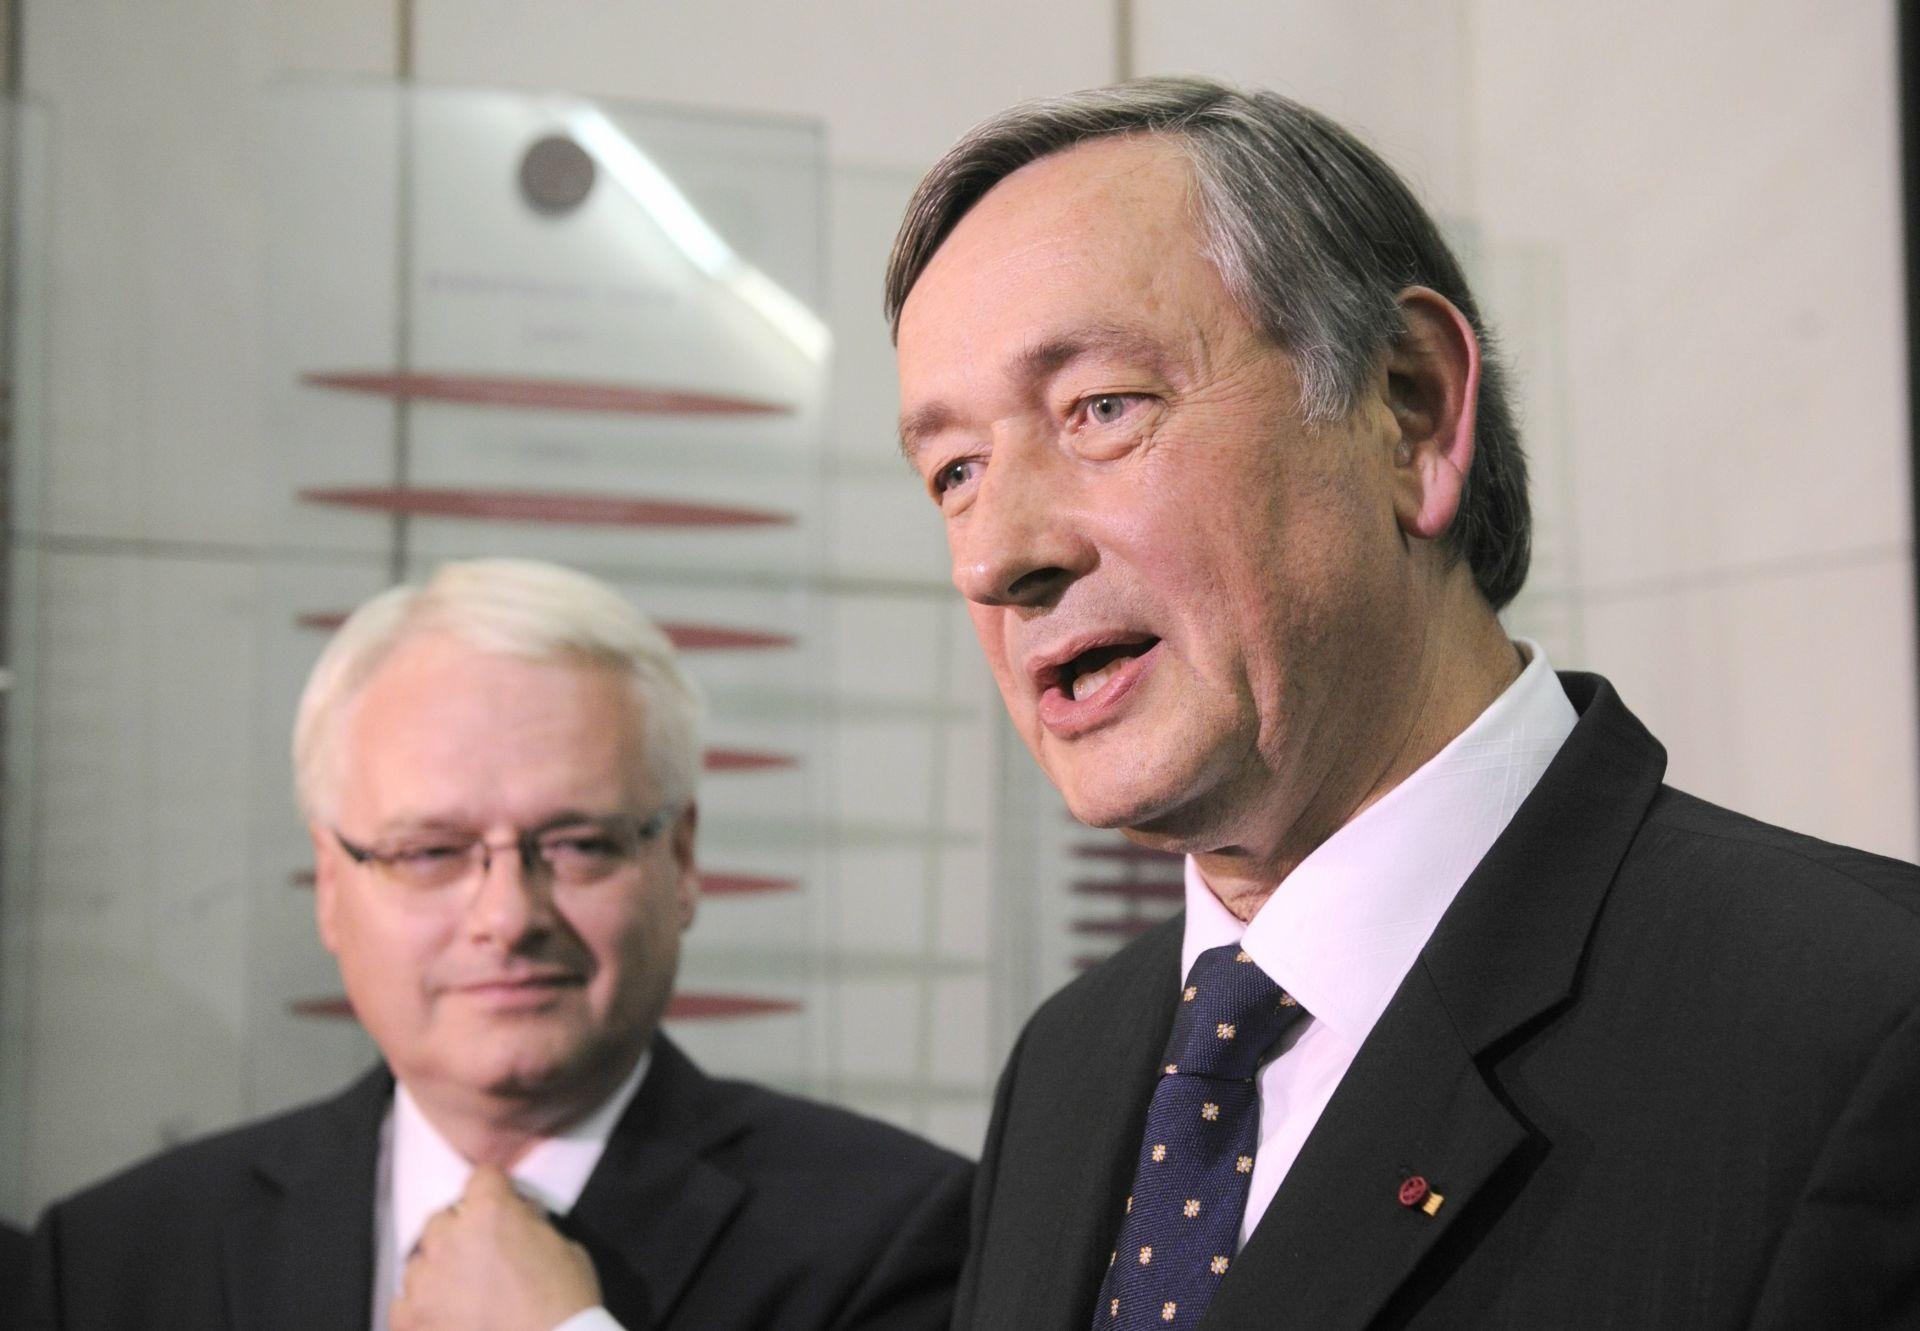 SLOVENIJA Tuerk navodno zainteresiran za mjesto glavnog tajnika OESS-a